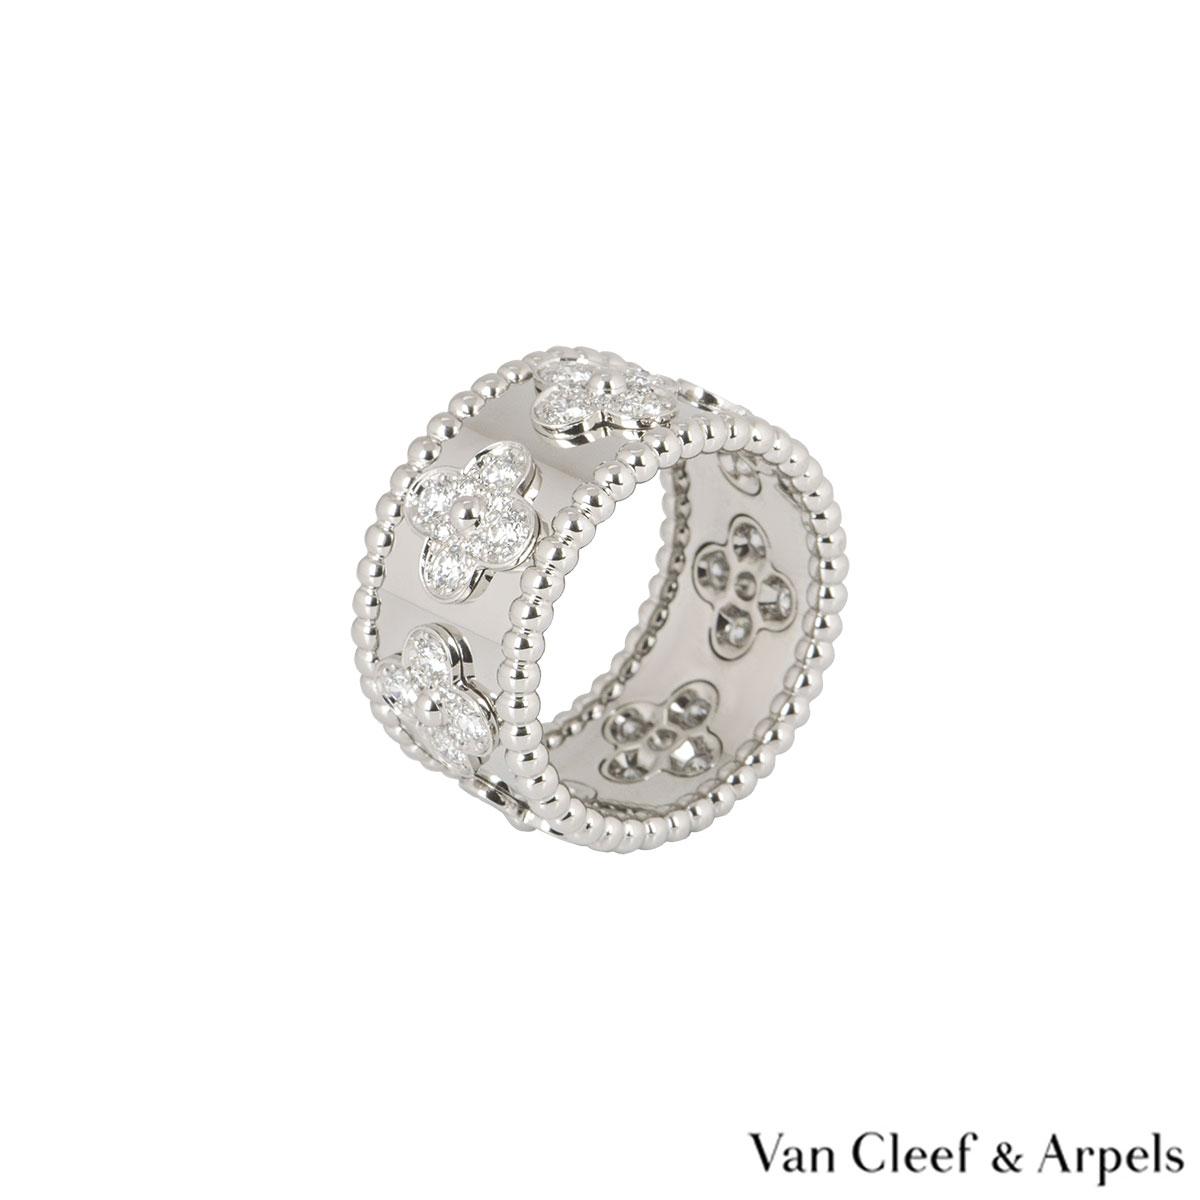 Van Cleef & Arpels White Gold Diamond Perlée Clovers Medium Ring